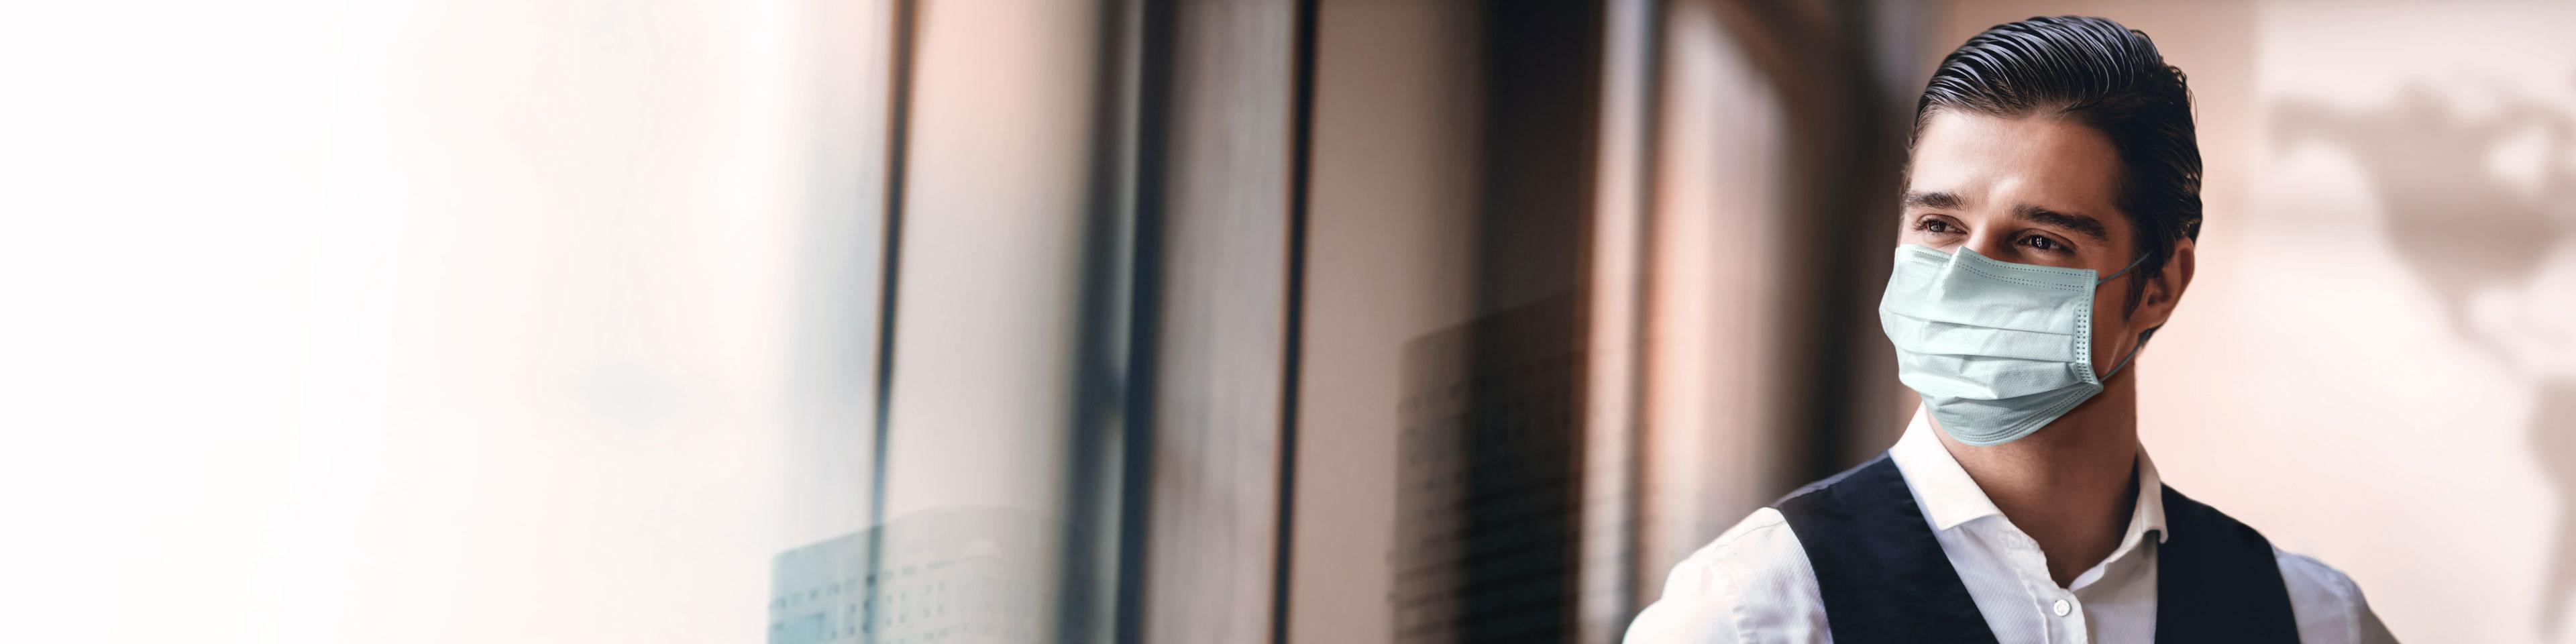 covid mask business cityscape